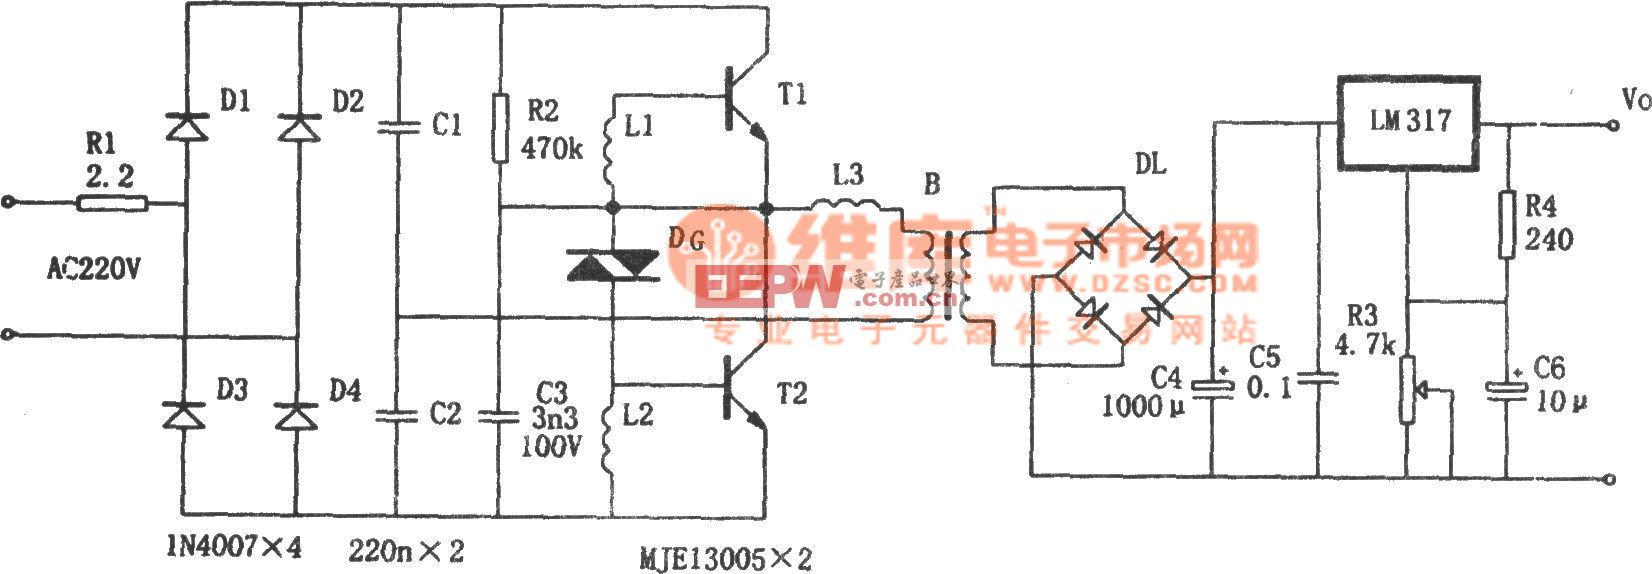 LM317构成的电子变压稳压电源